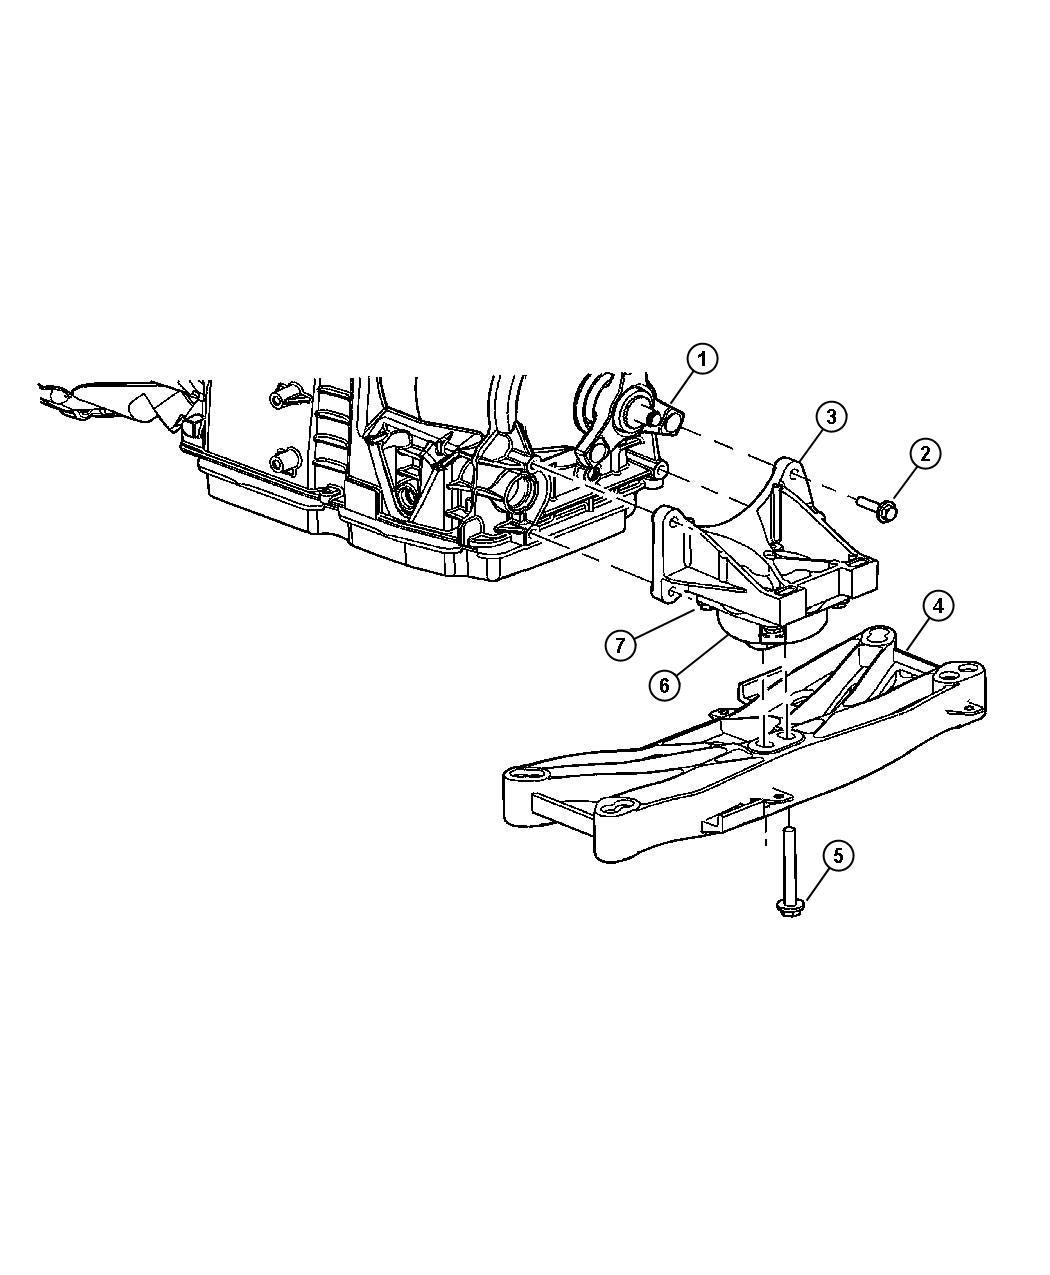 Chrysler 300 Mount. Transmission. Support, structural, rwd